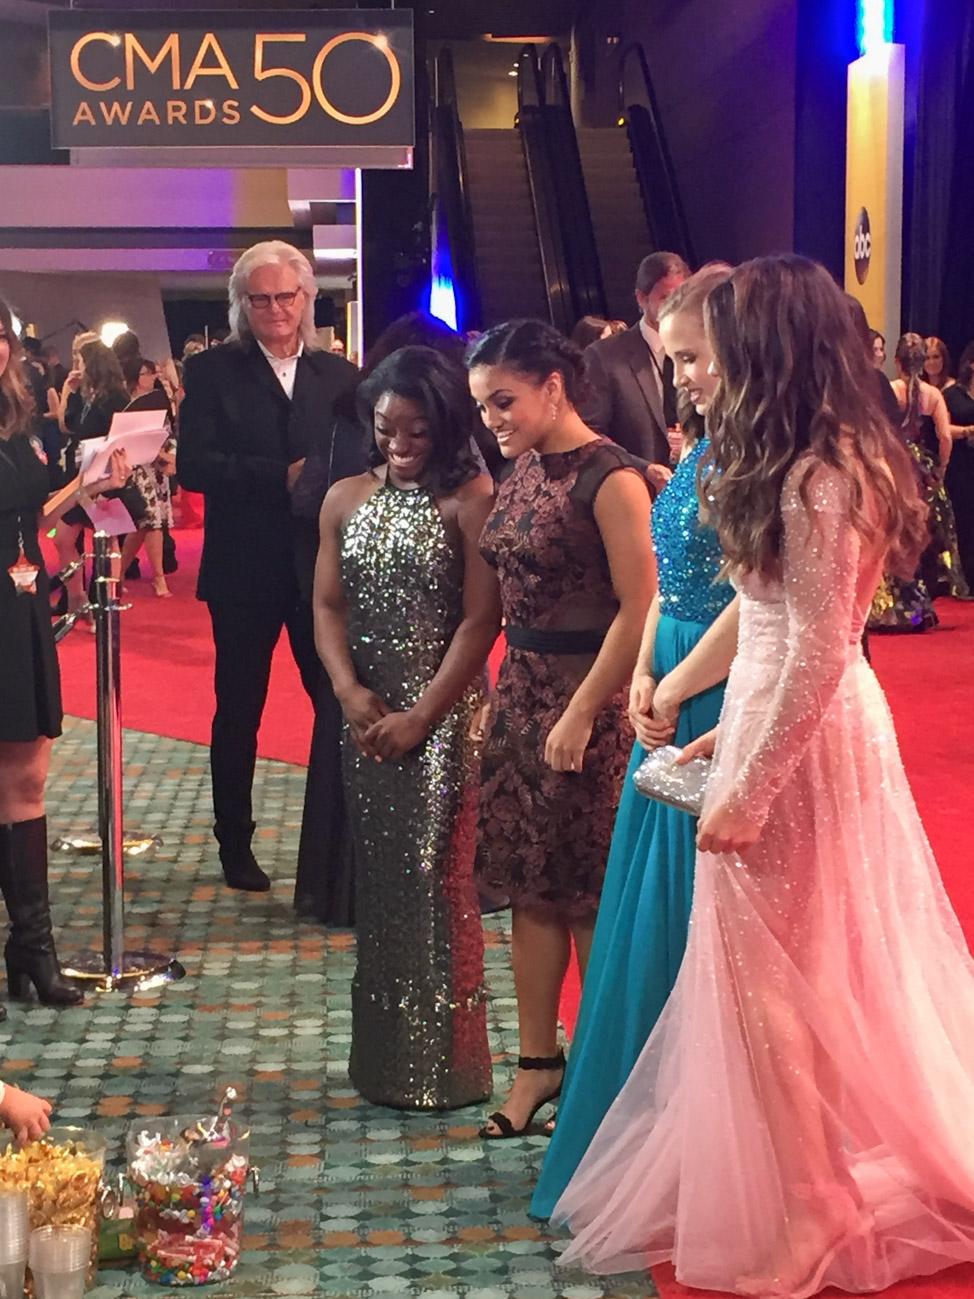 CMA Awards Red Carpet on camera hosting